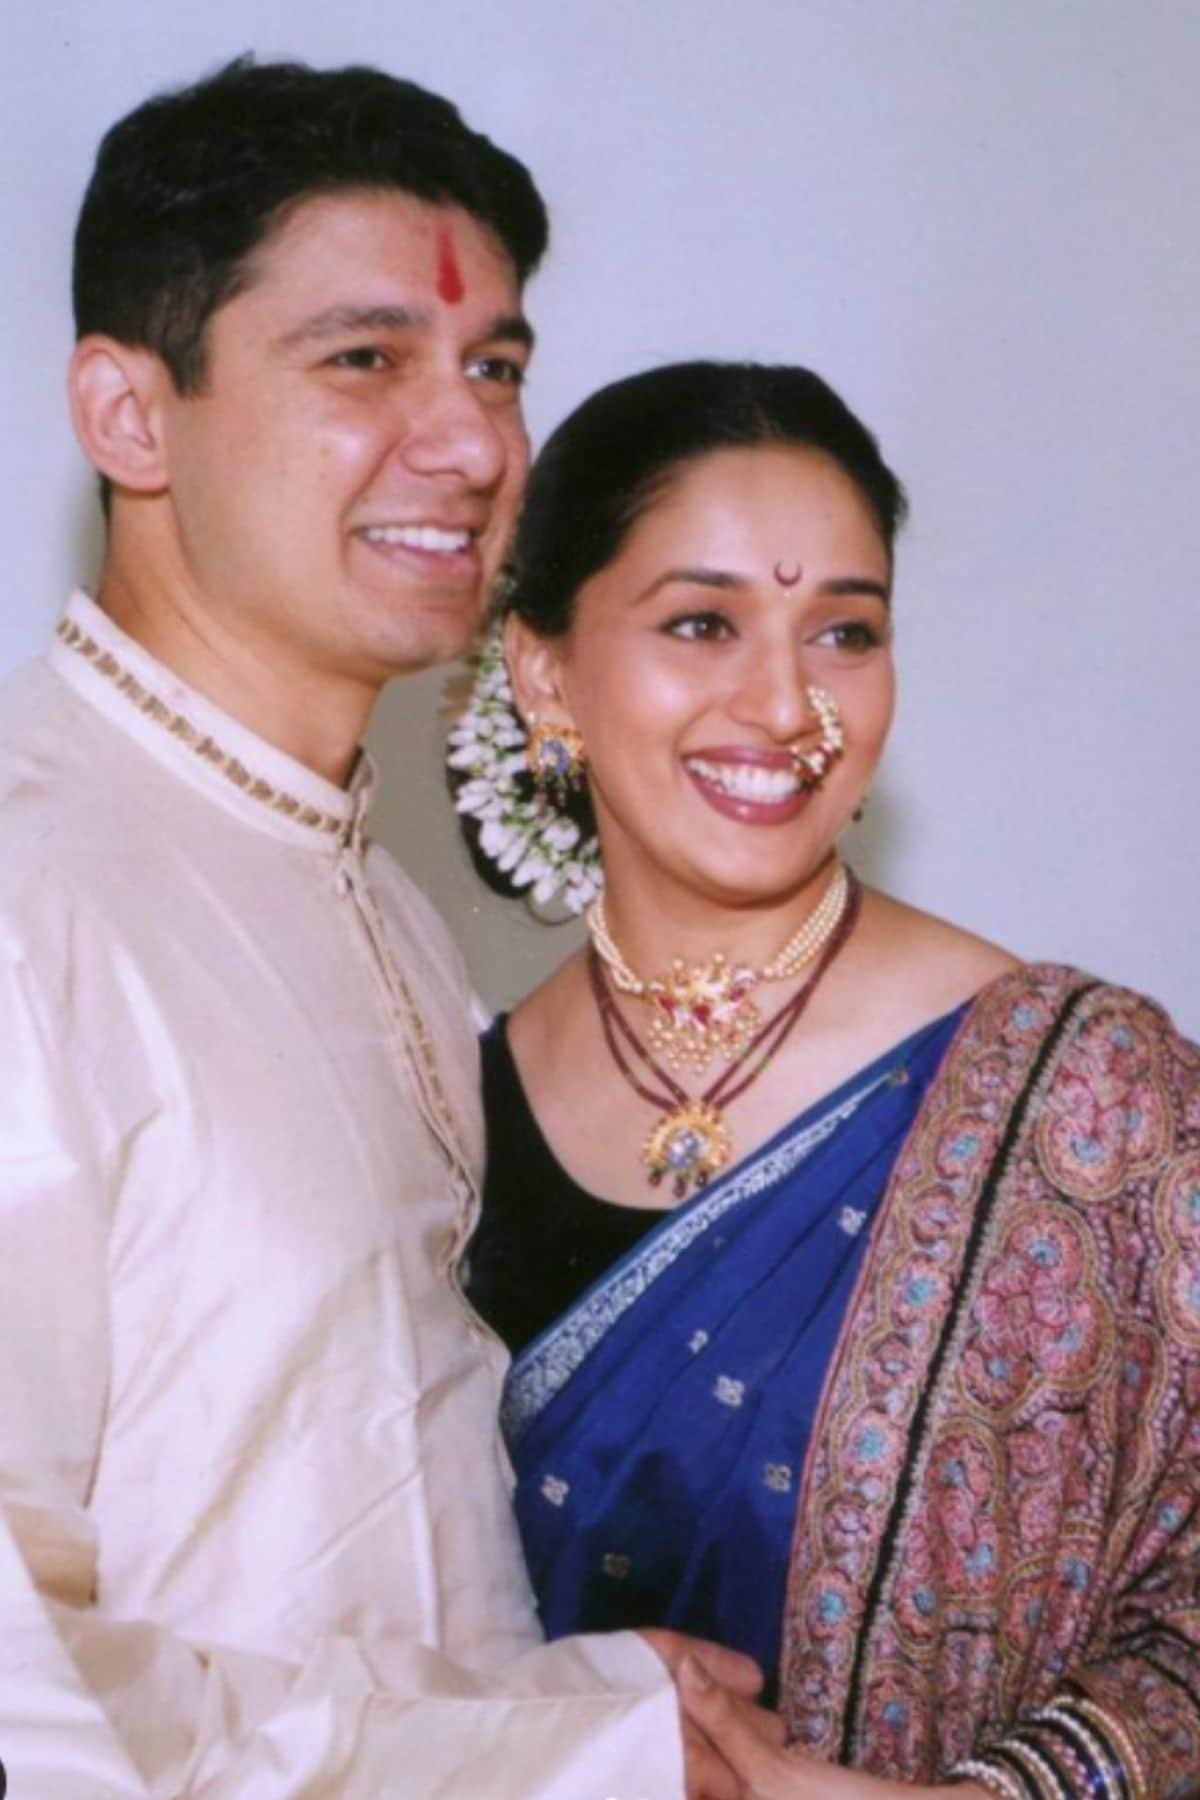 Madhuri Dixit, Madhuri Dixit couple moments, Madhuri Dixit photos, Madhuri Dixit Ram Nene, माधुरी दीक्षित, श्रीराम नेने